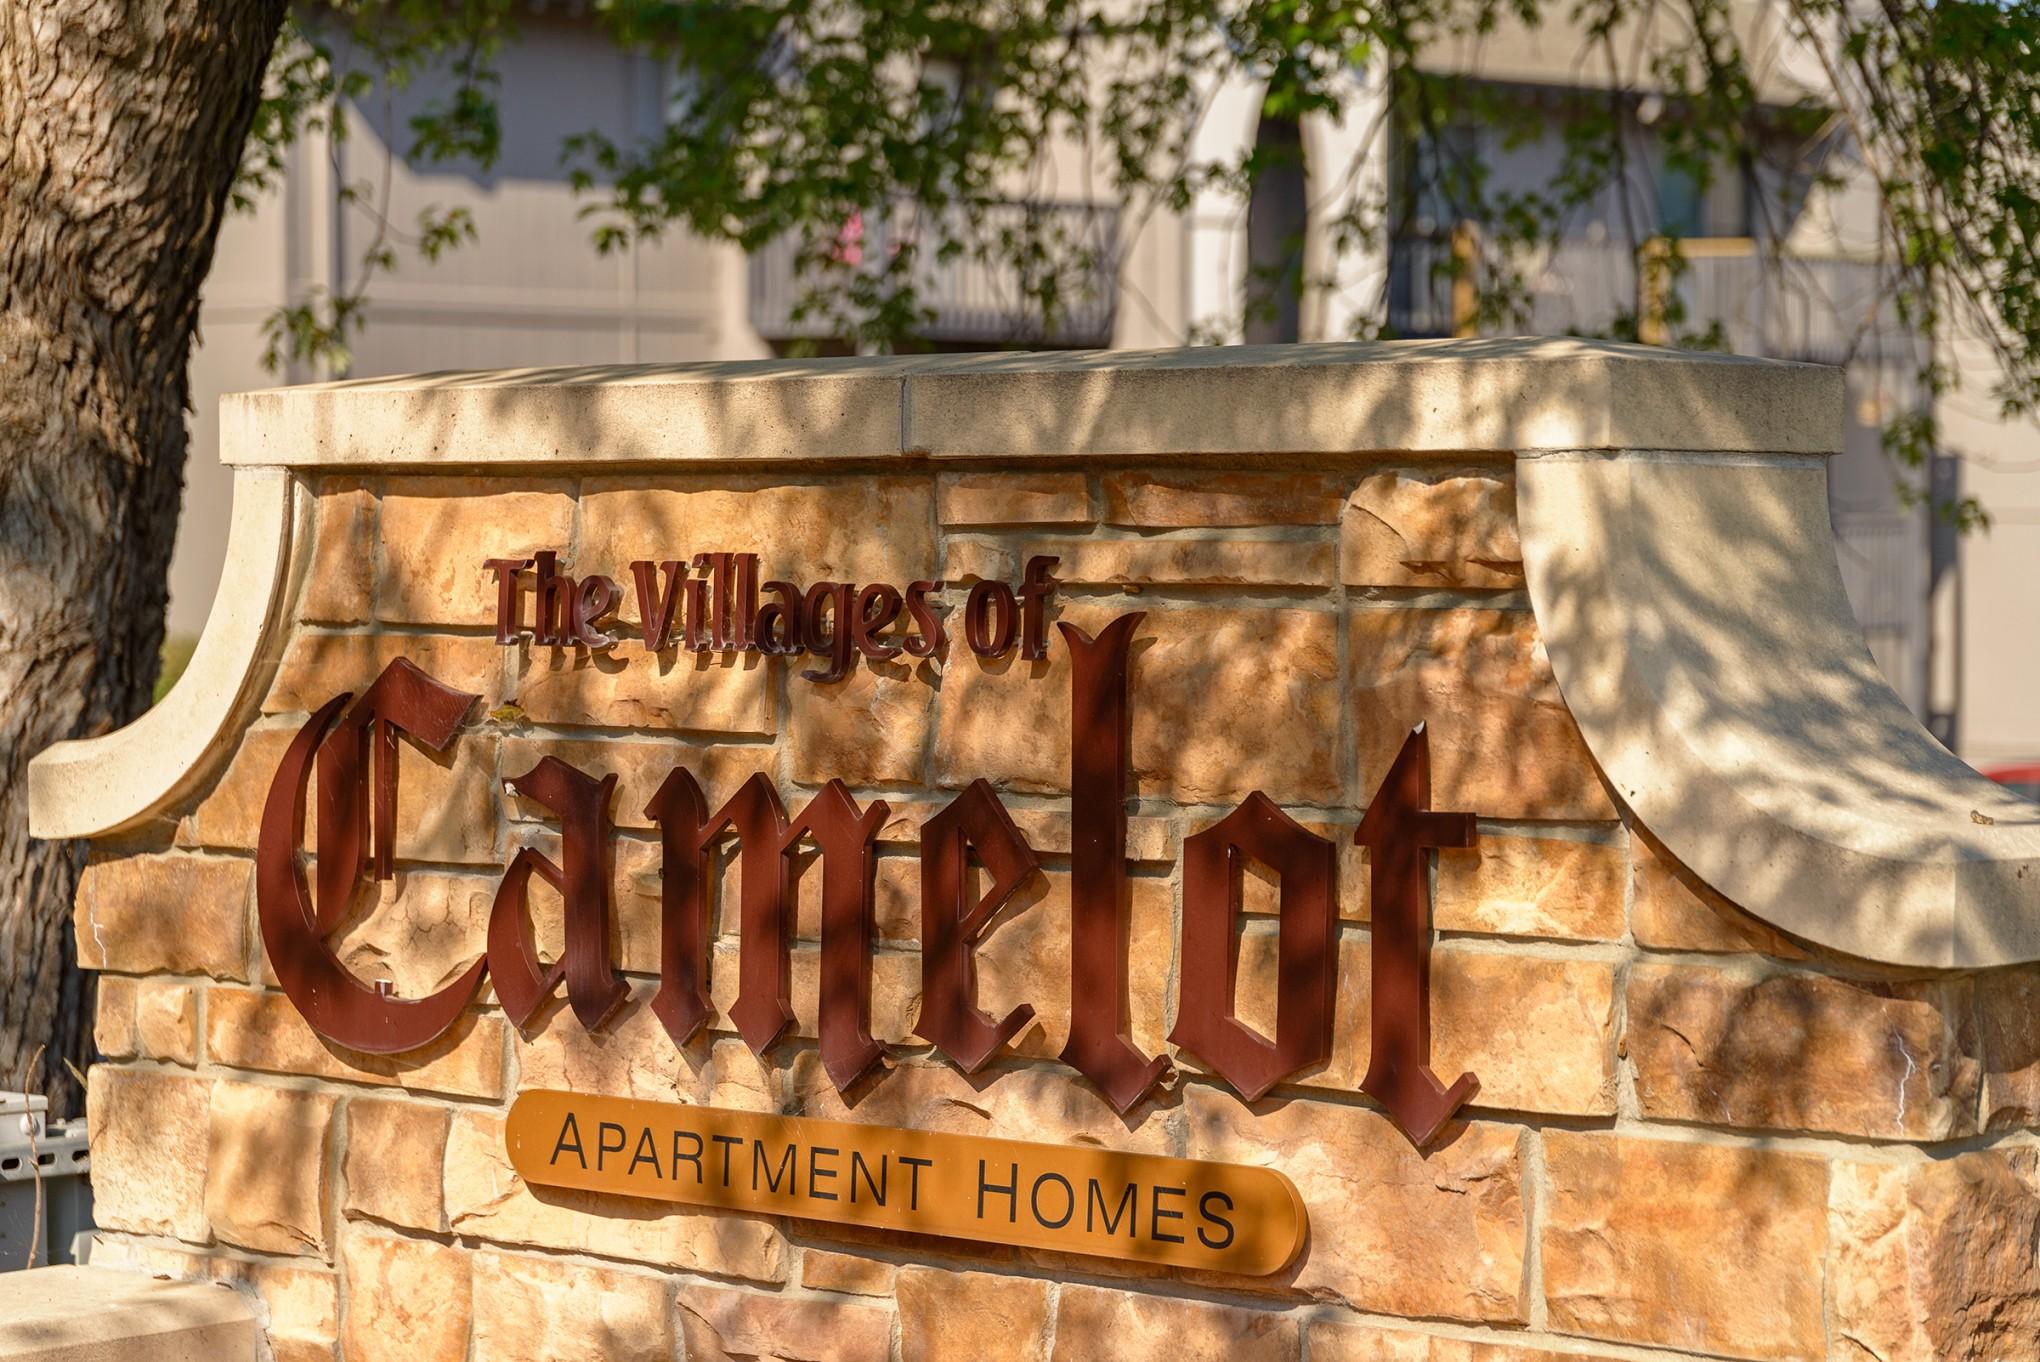 Camelot Village